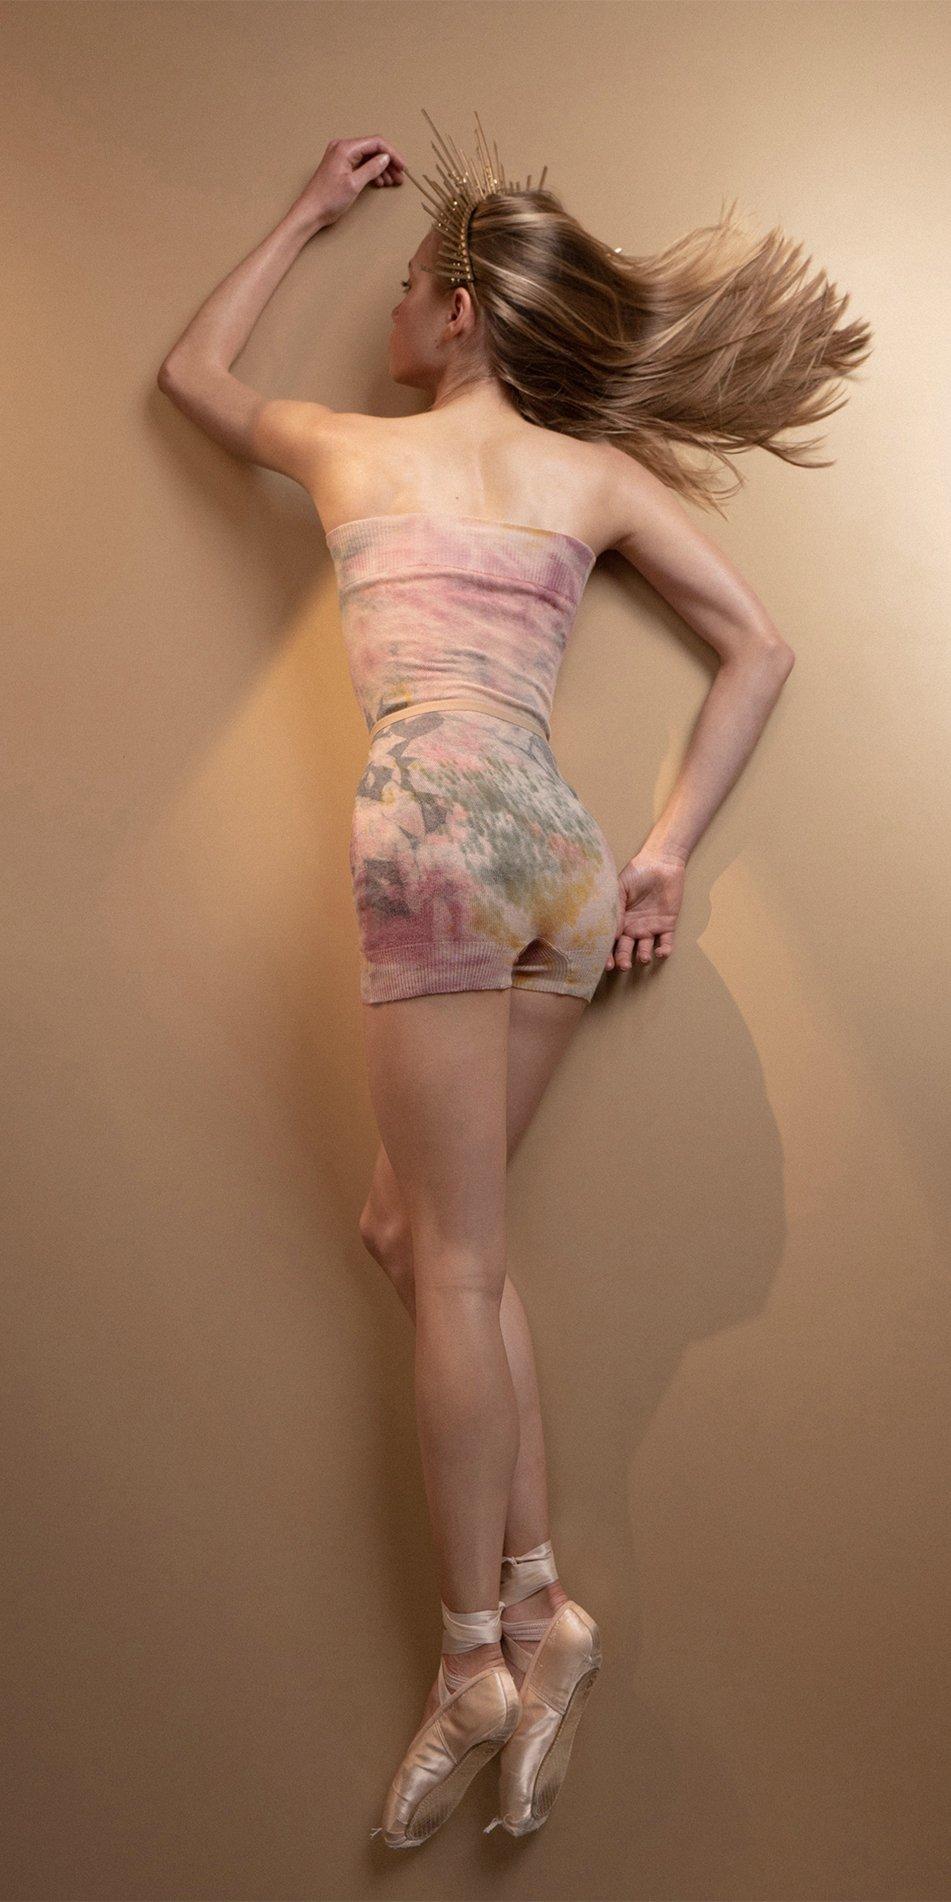 TIETIE DYE KNIWEAR shorts burgundy 11